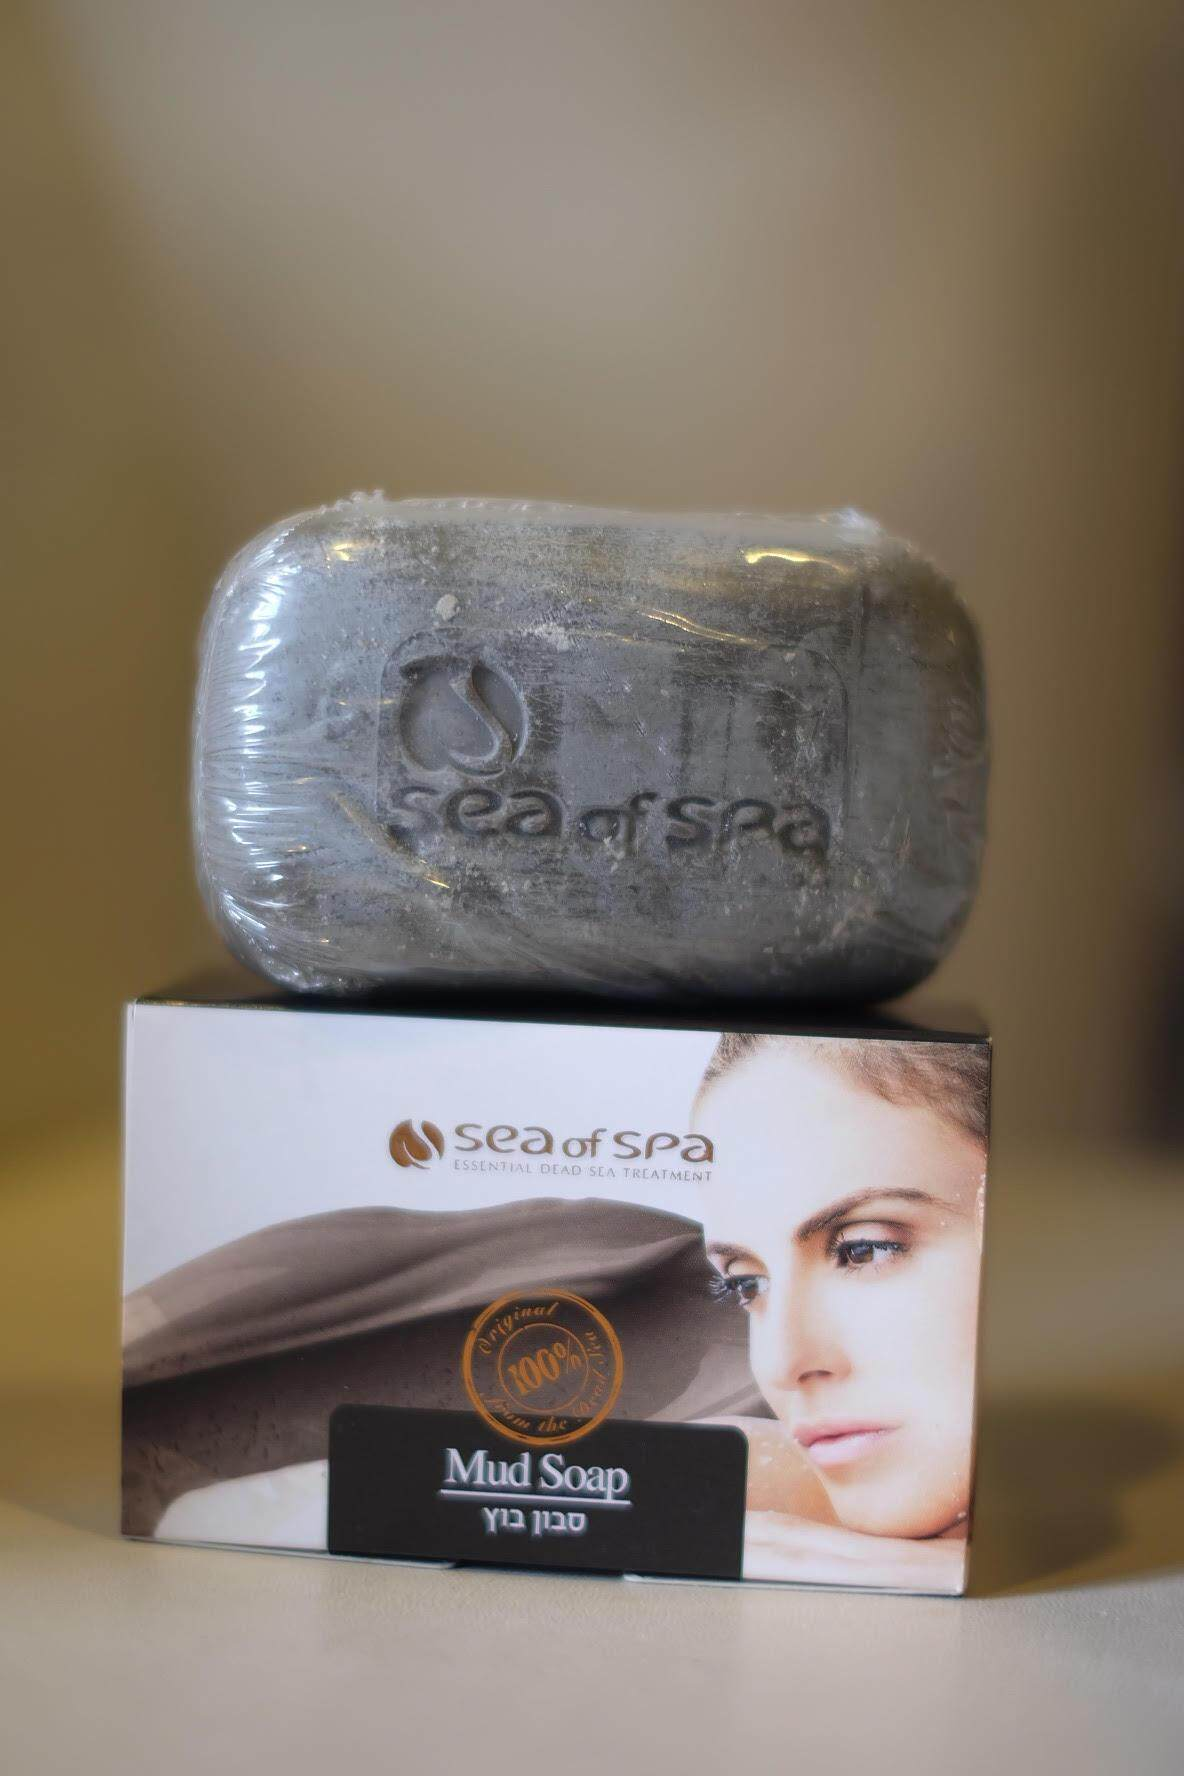 Mud Soap - Original from Dead sea สบู่จากแร่ธาตุโคลนดำทะเลสาบเดดซี 100%